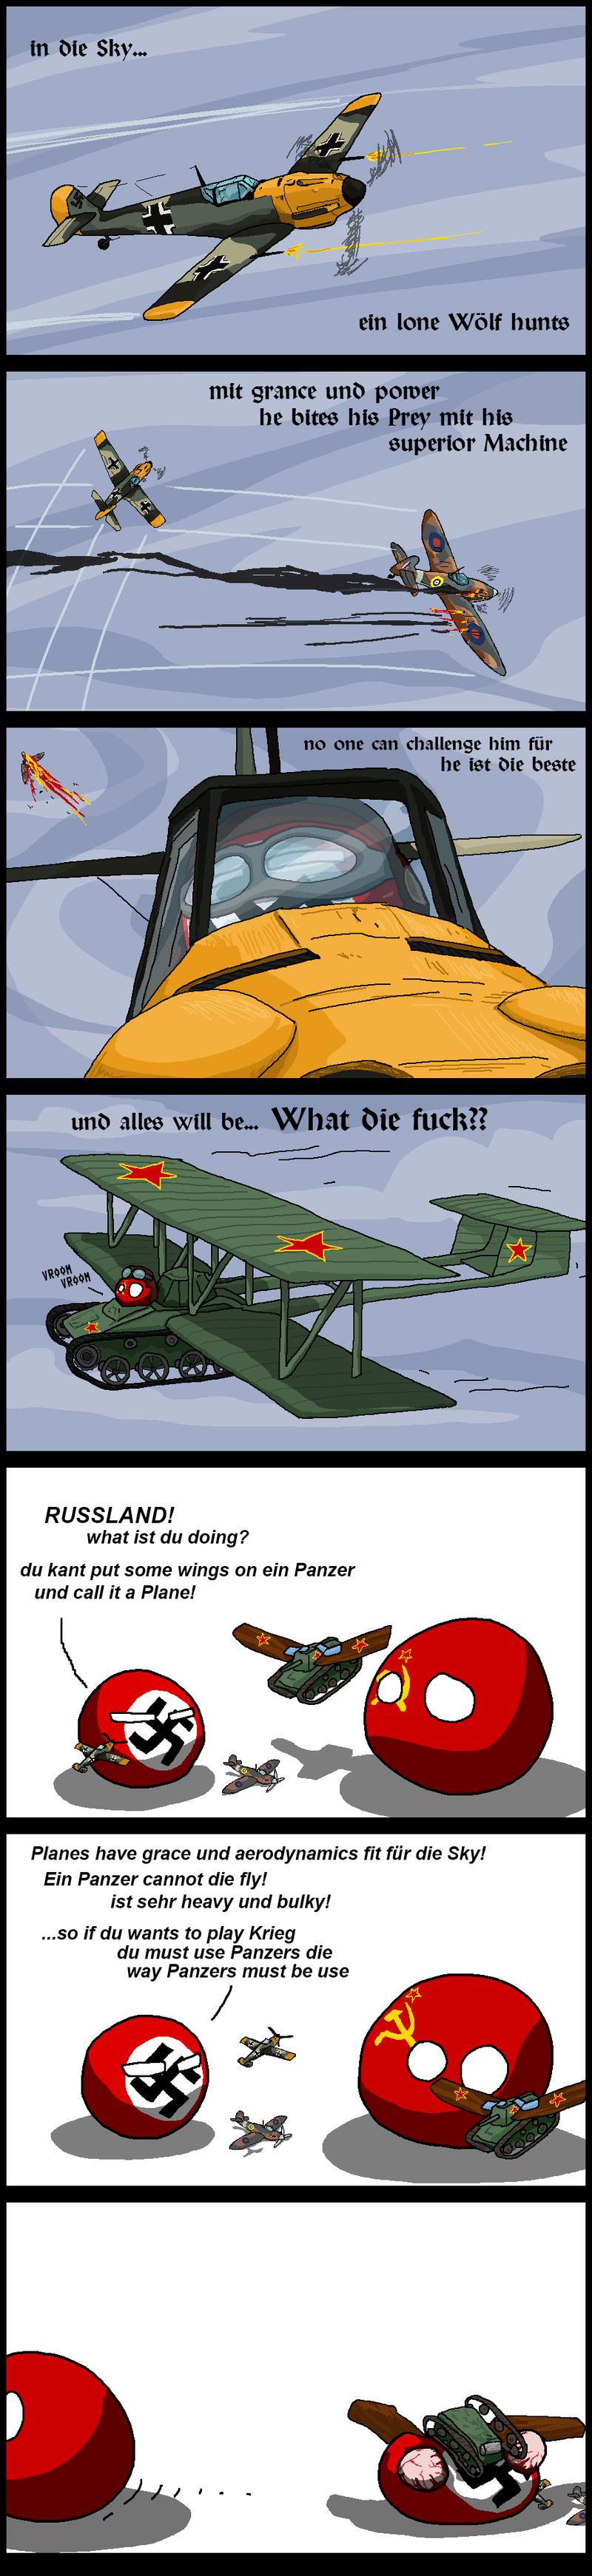 https://en.wikipedia.org/wiki/Antonov_A-40